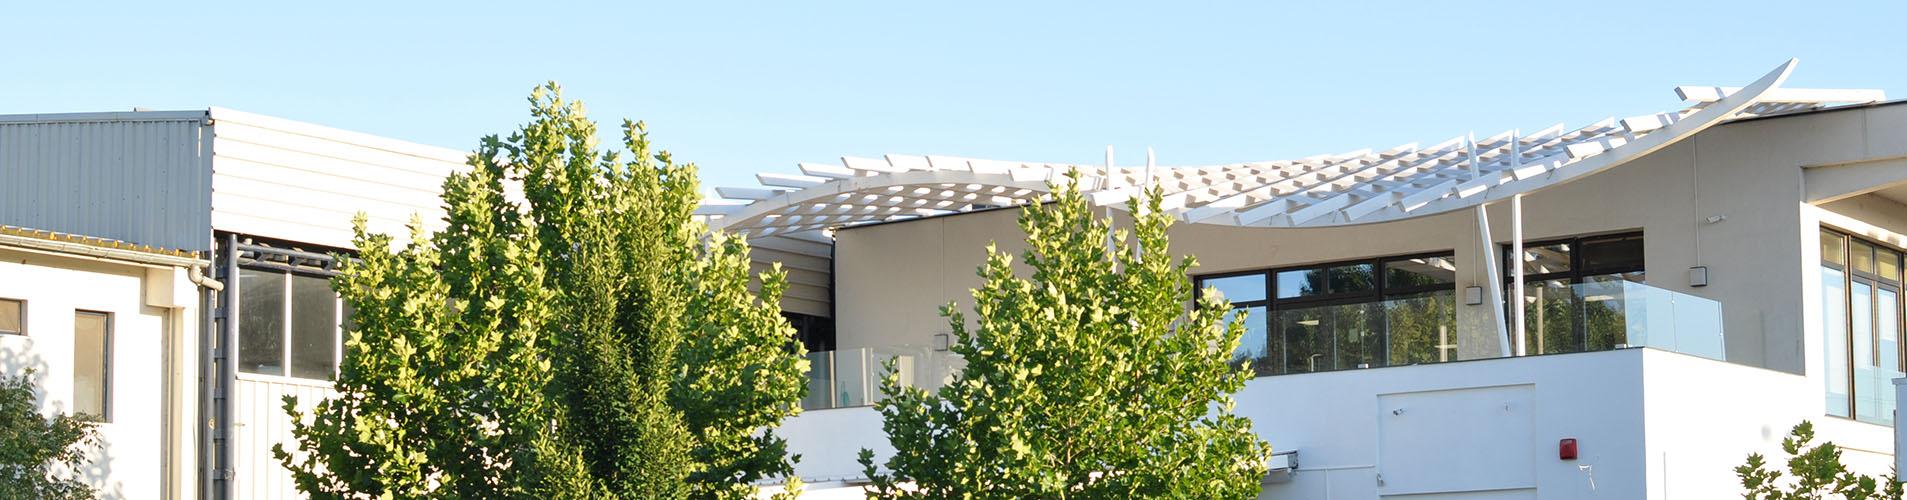 Vedere din exterior cu cladirea in care se afla Clubul Popeci